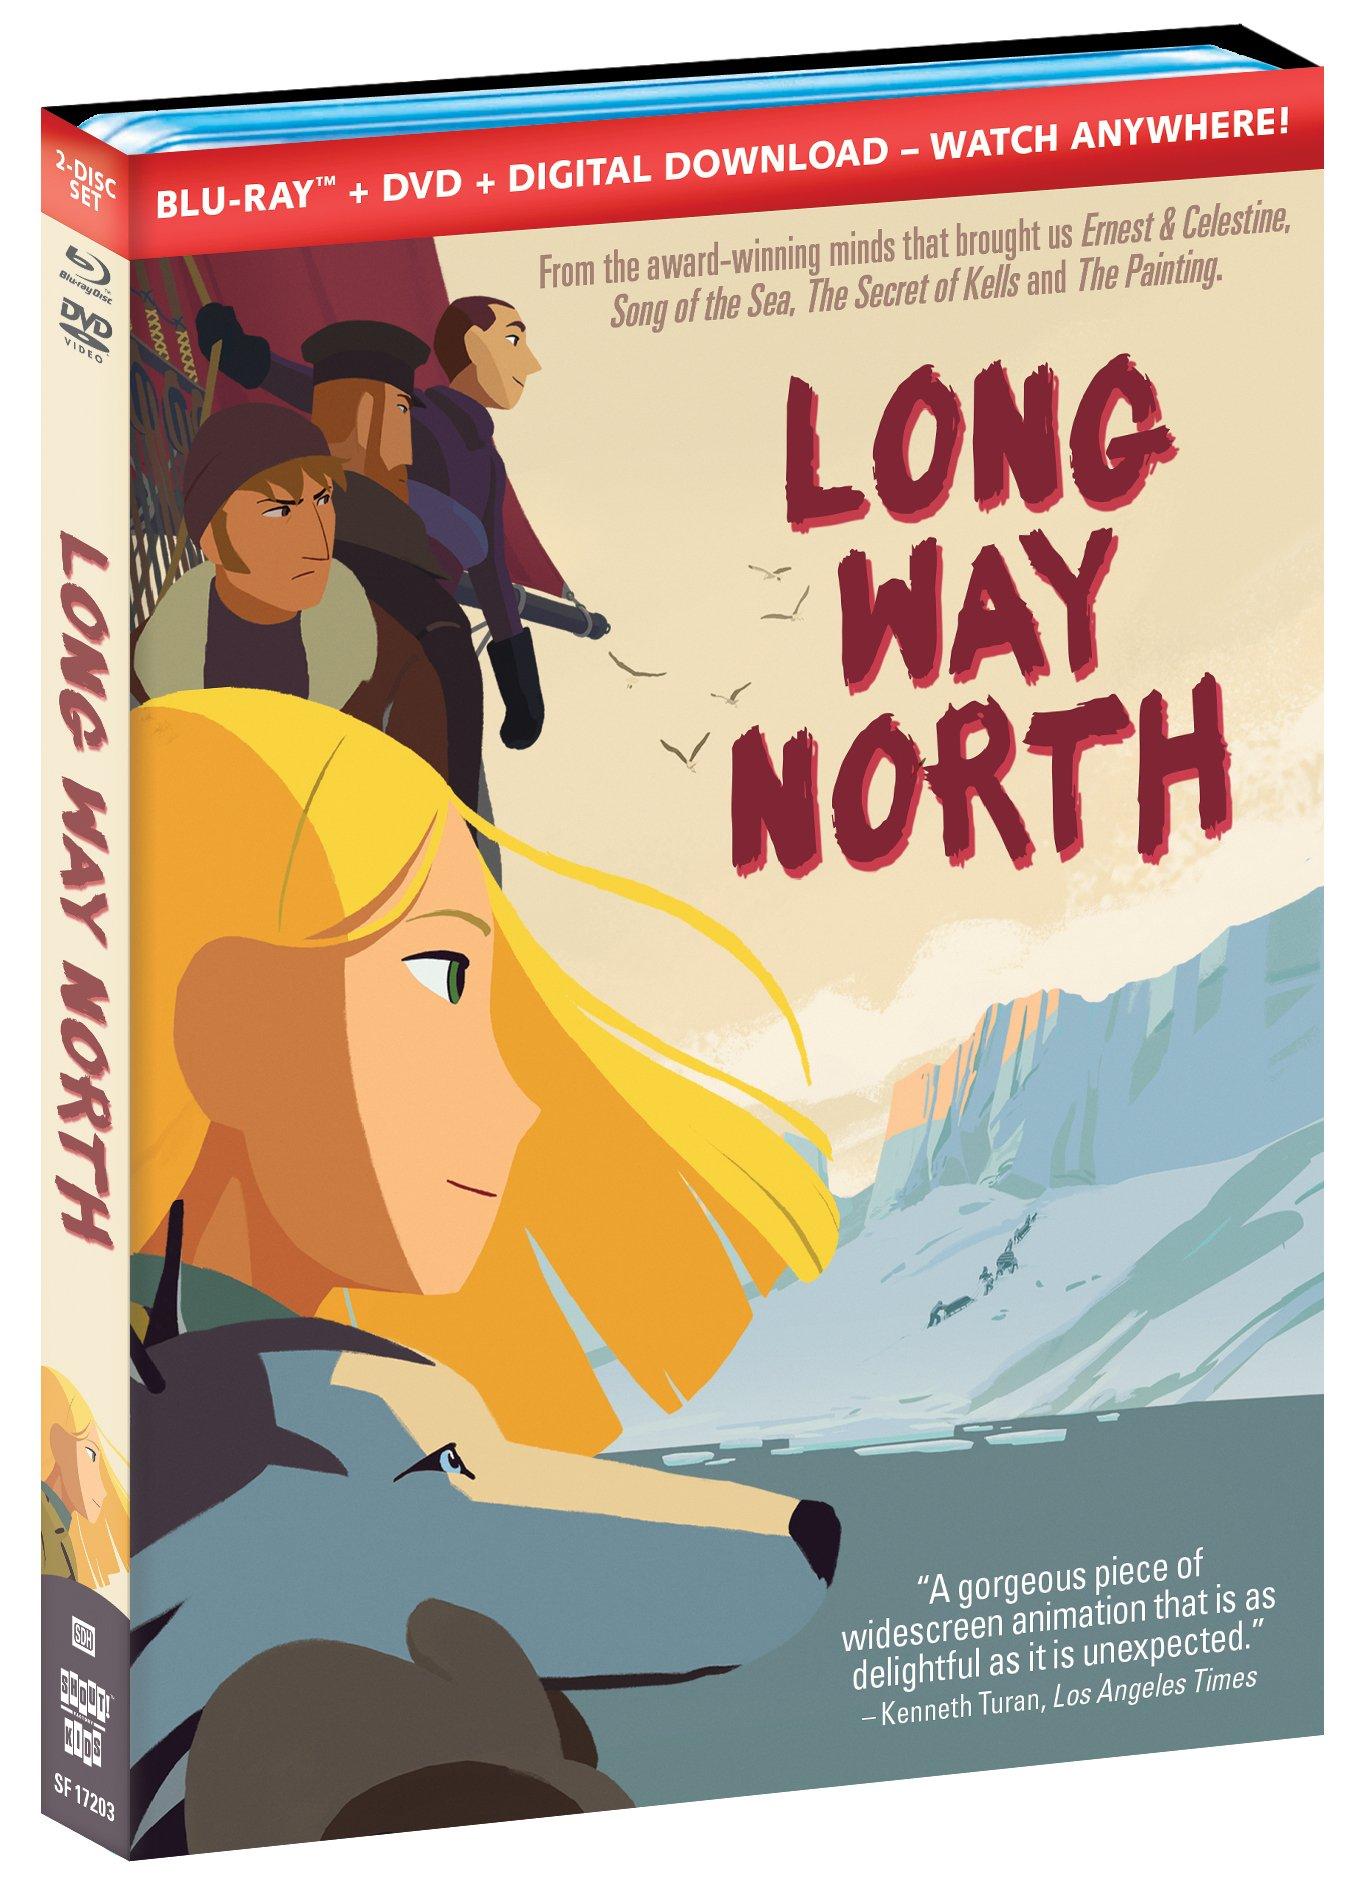 Buy Long Way North Now!